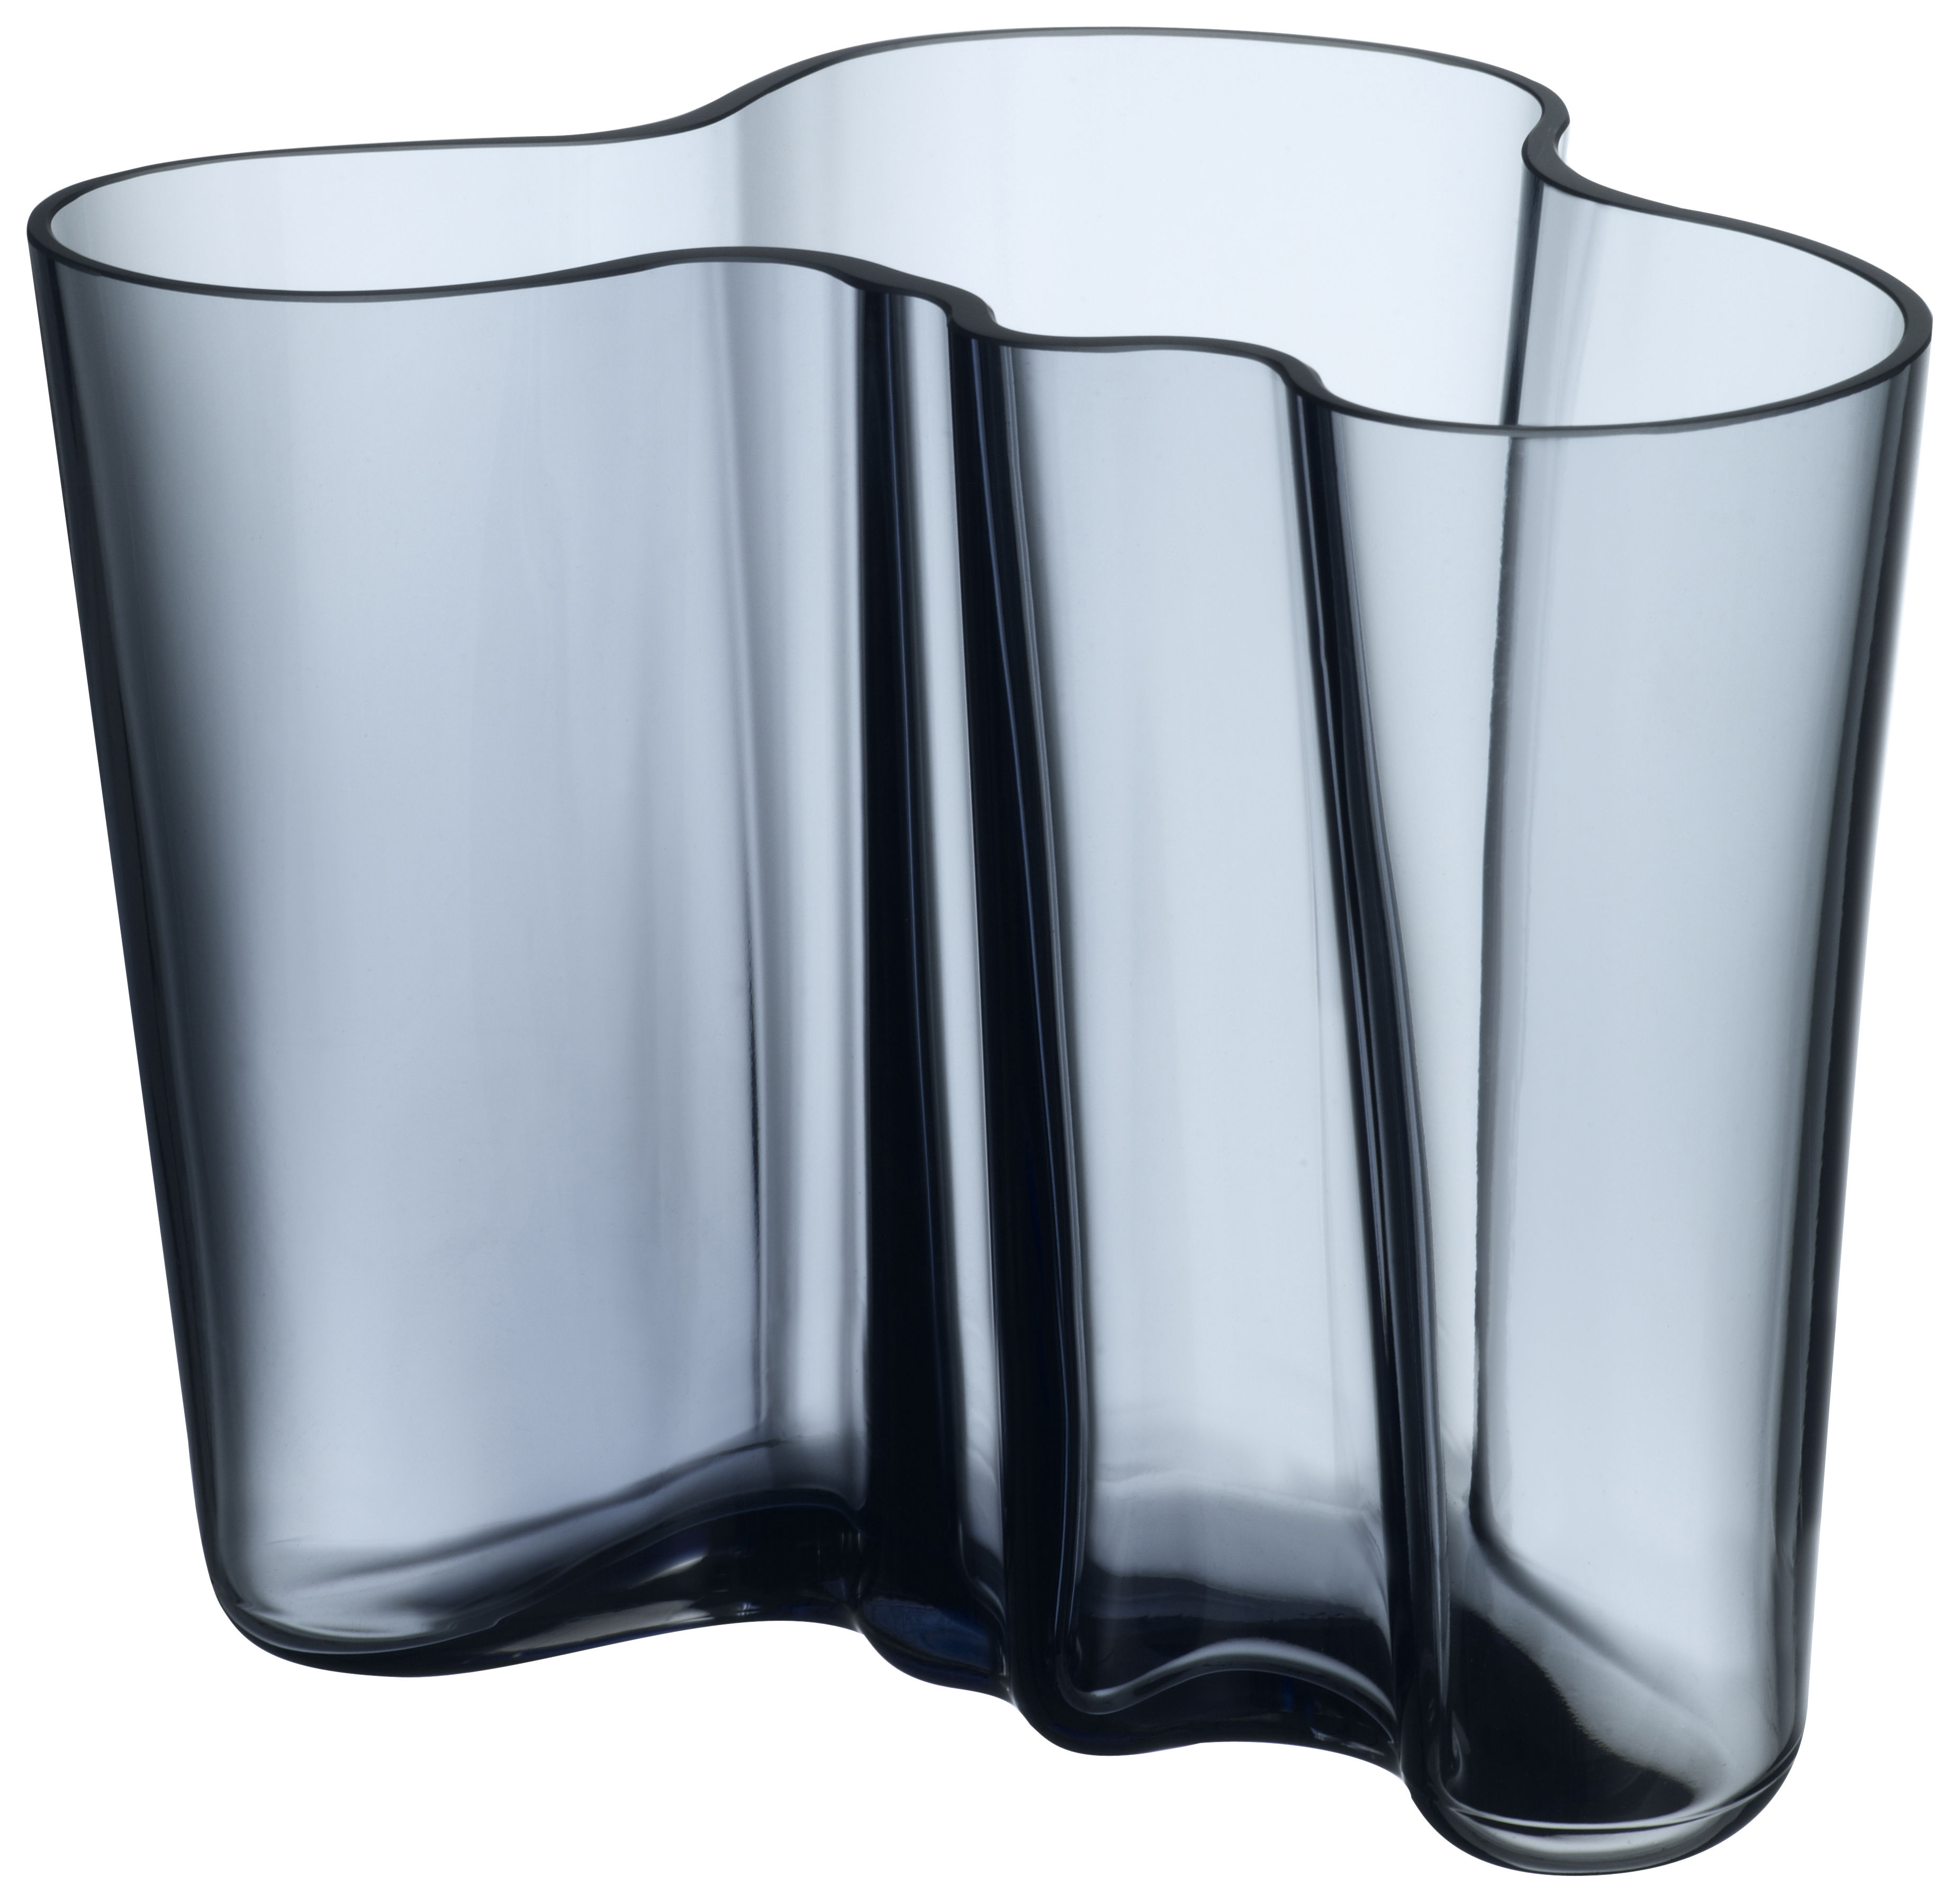 Dekoration - Vasen - Aalto Vase / H 16 cm - Iittala - Gewittergrau - geblasenes Glas